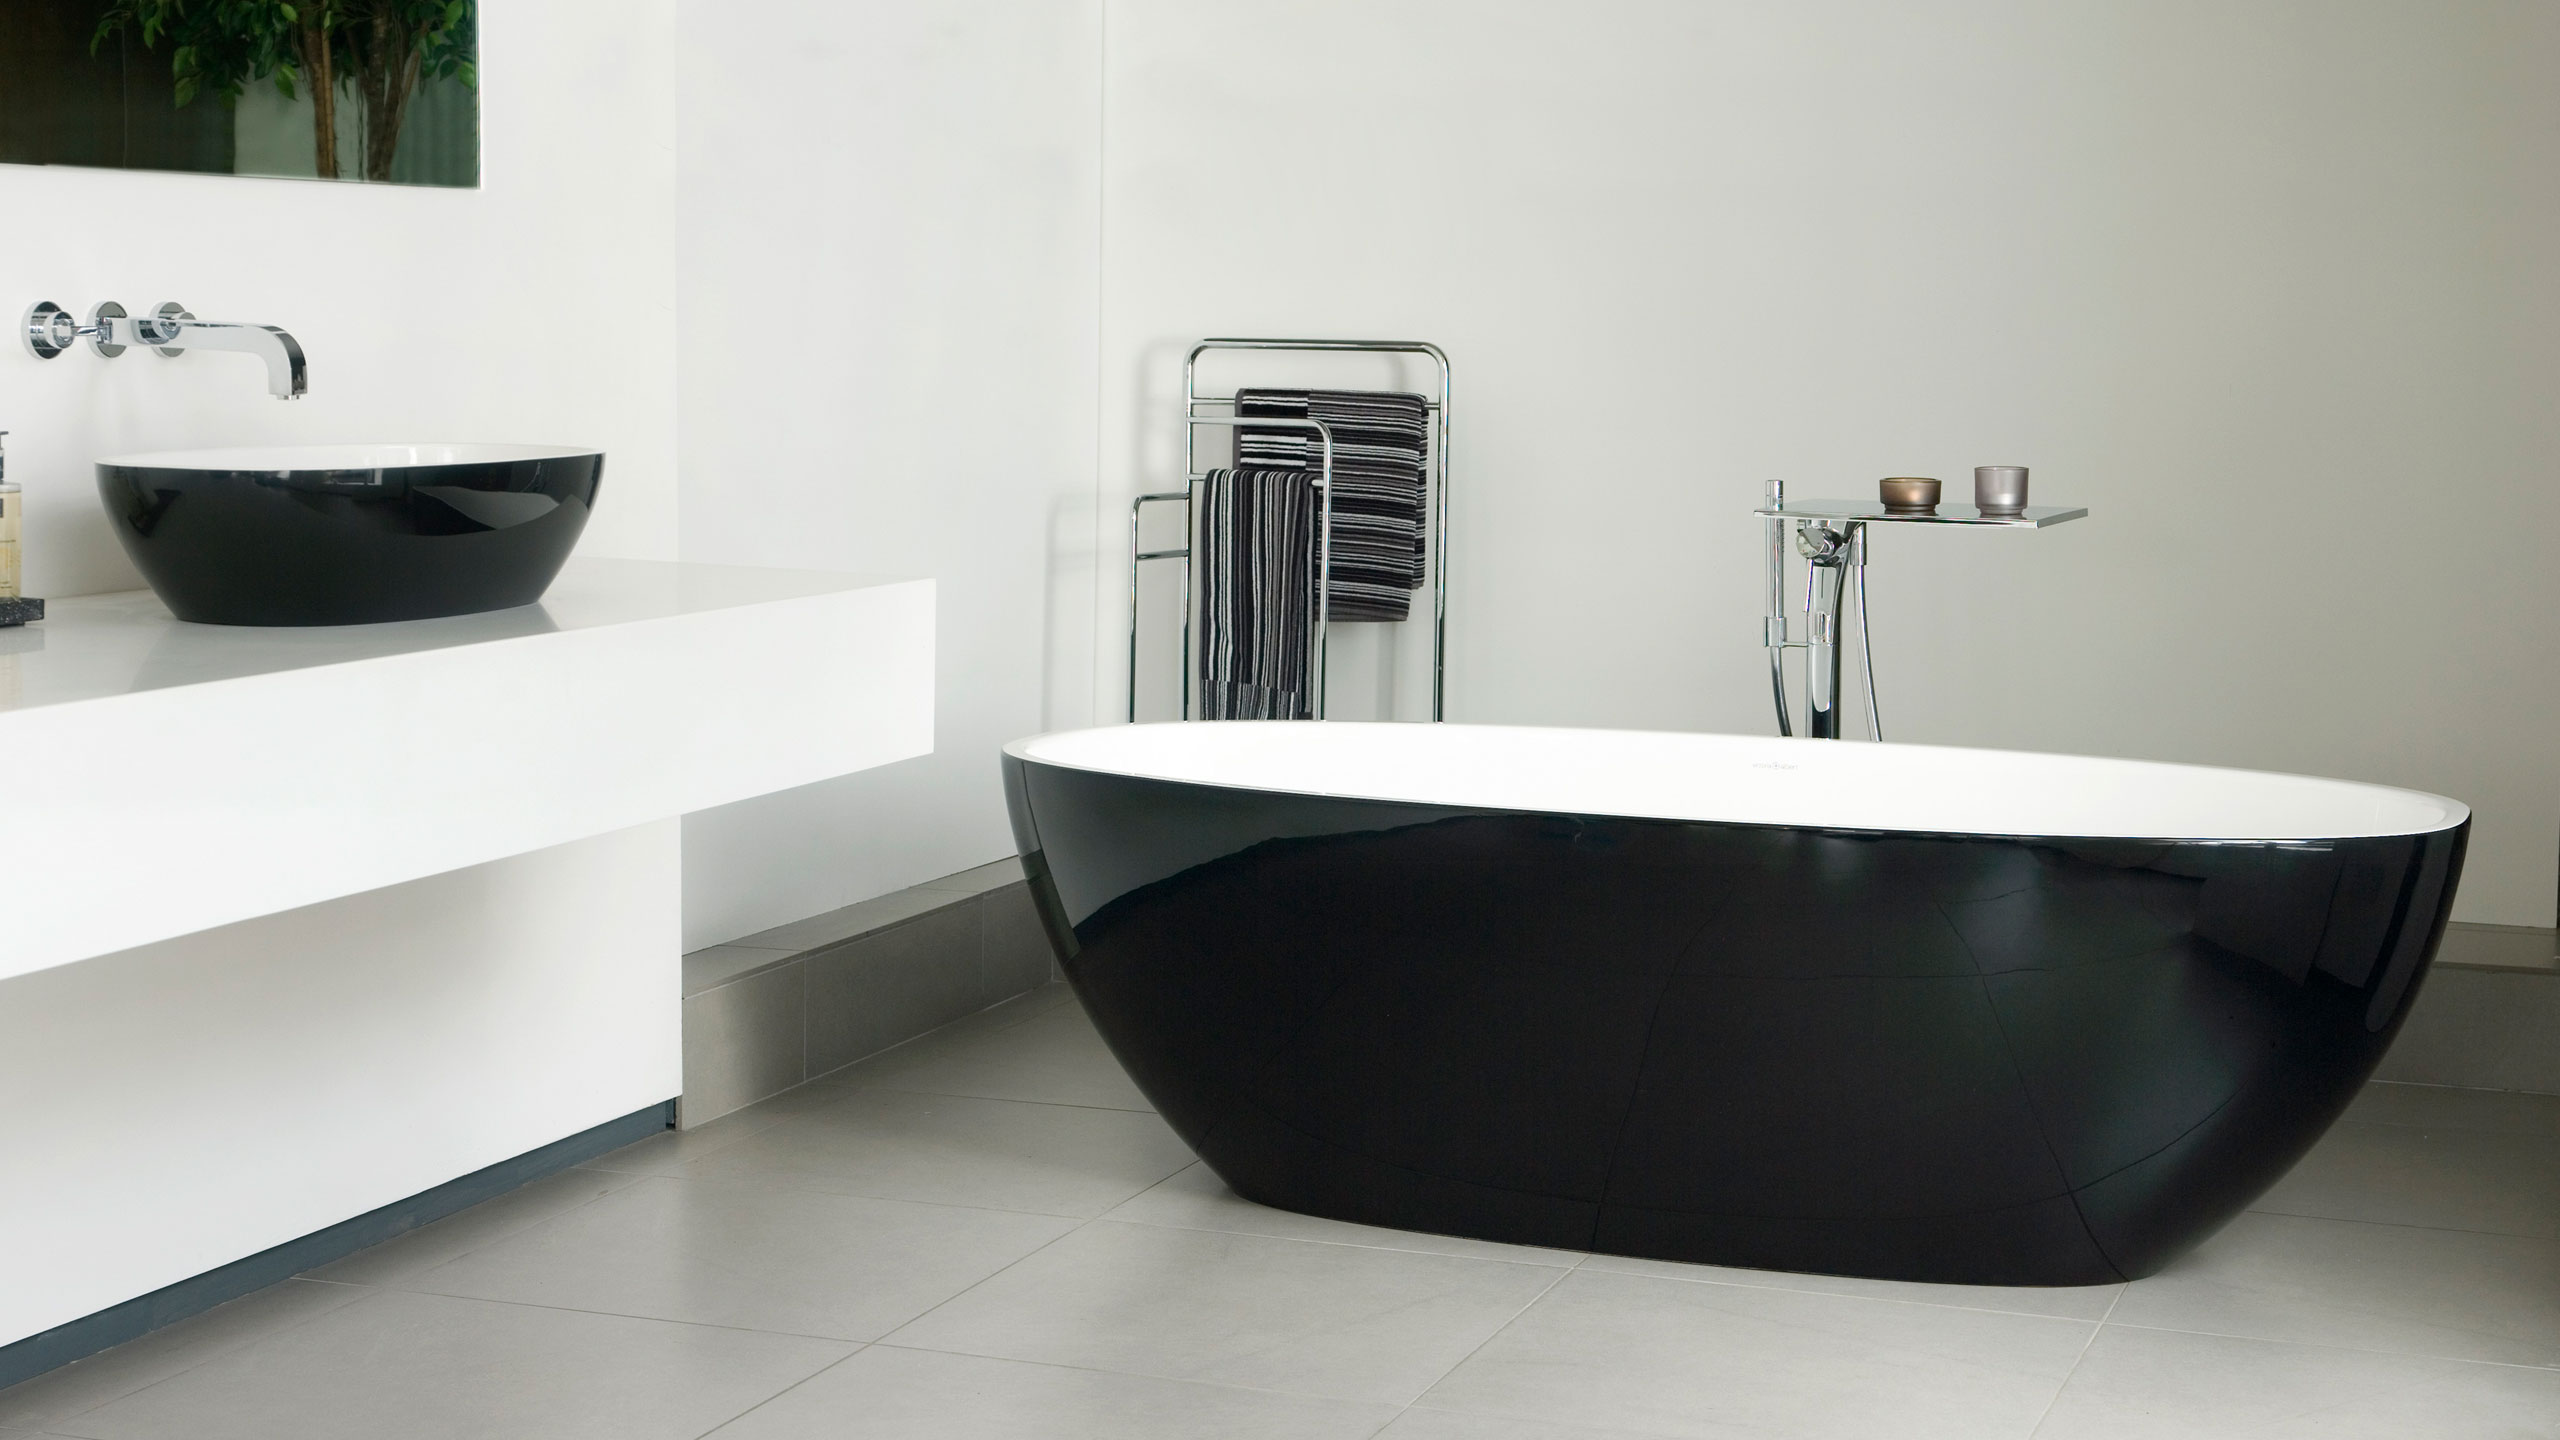 https://designerpages.s3.amazonaws.com/assets/61000251/Barcelona_Gallery_3black_EU.jpg